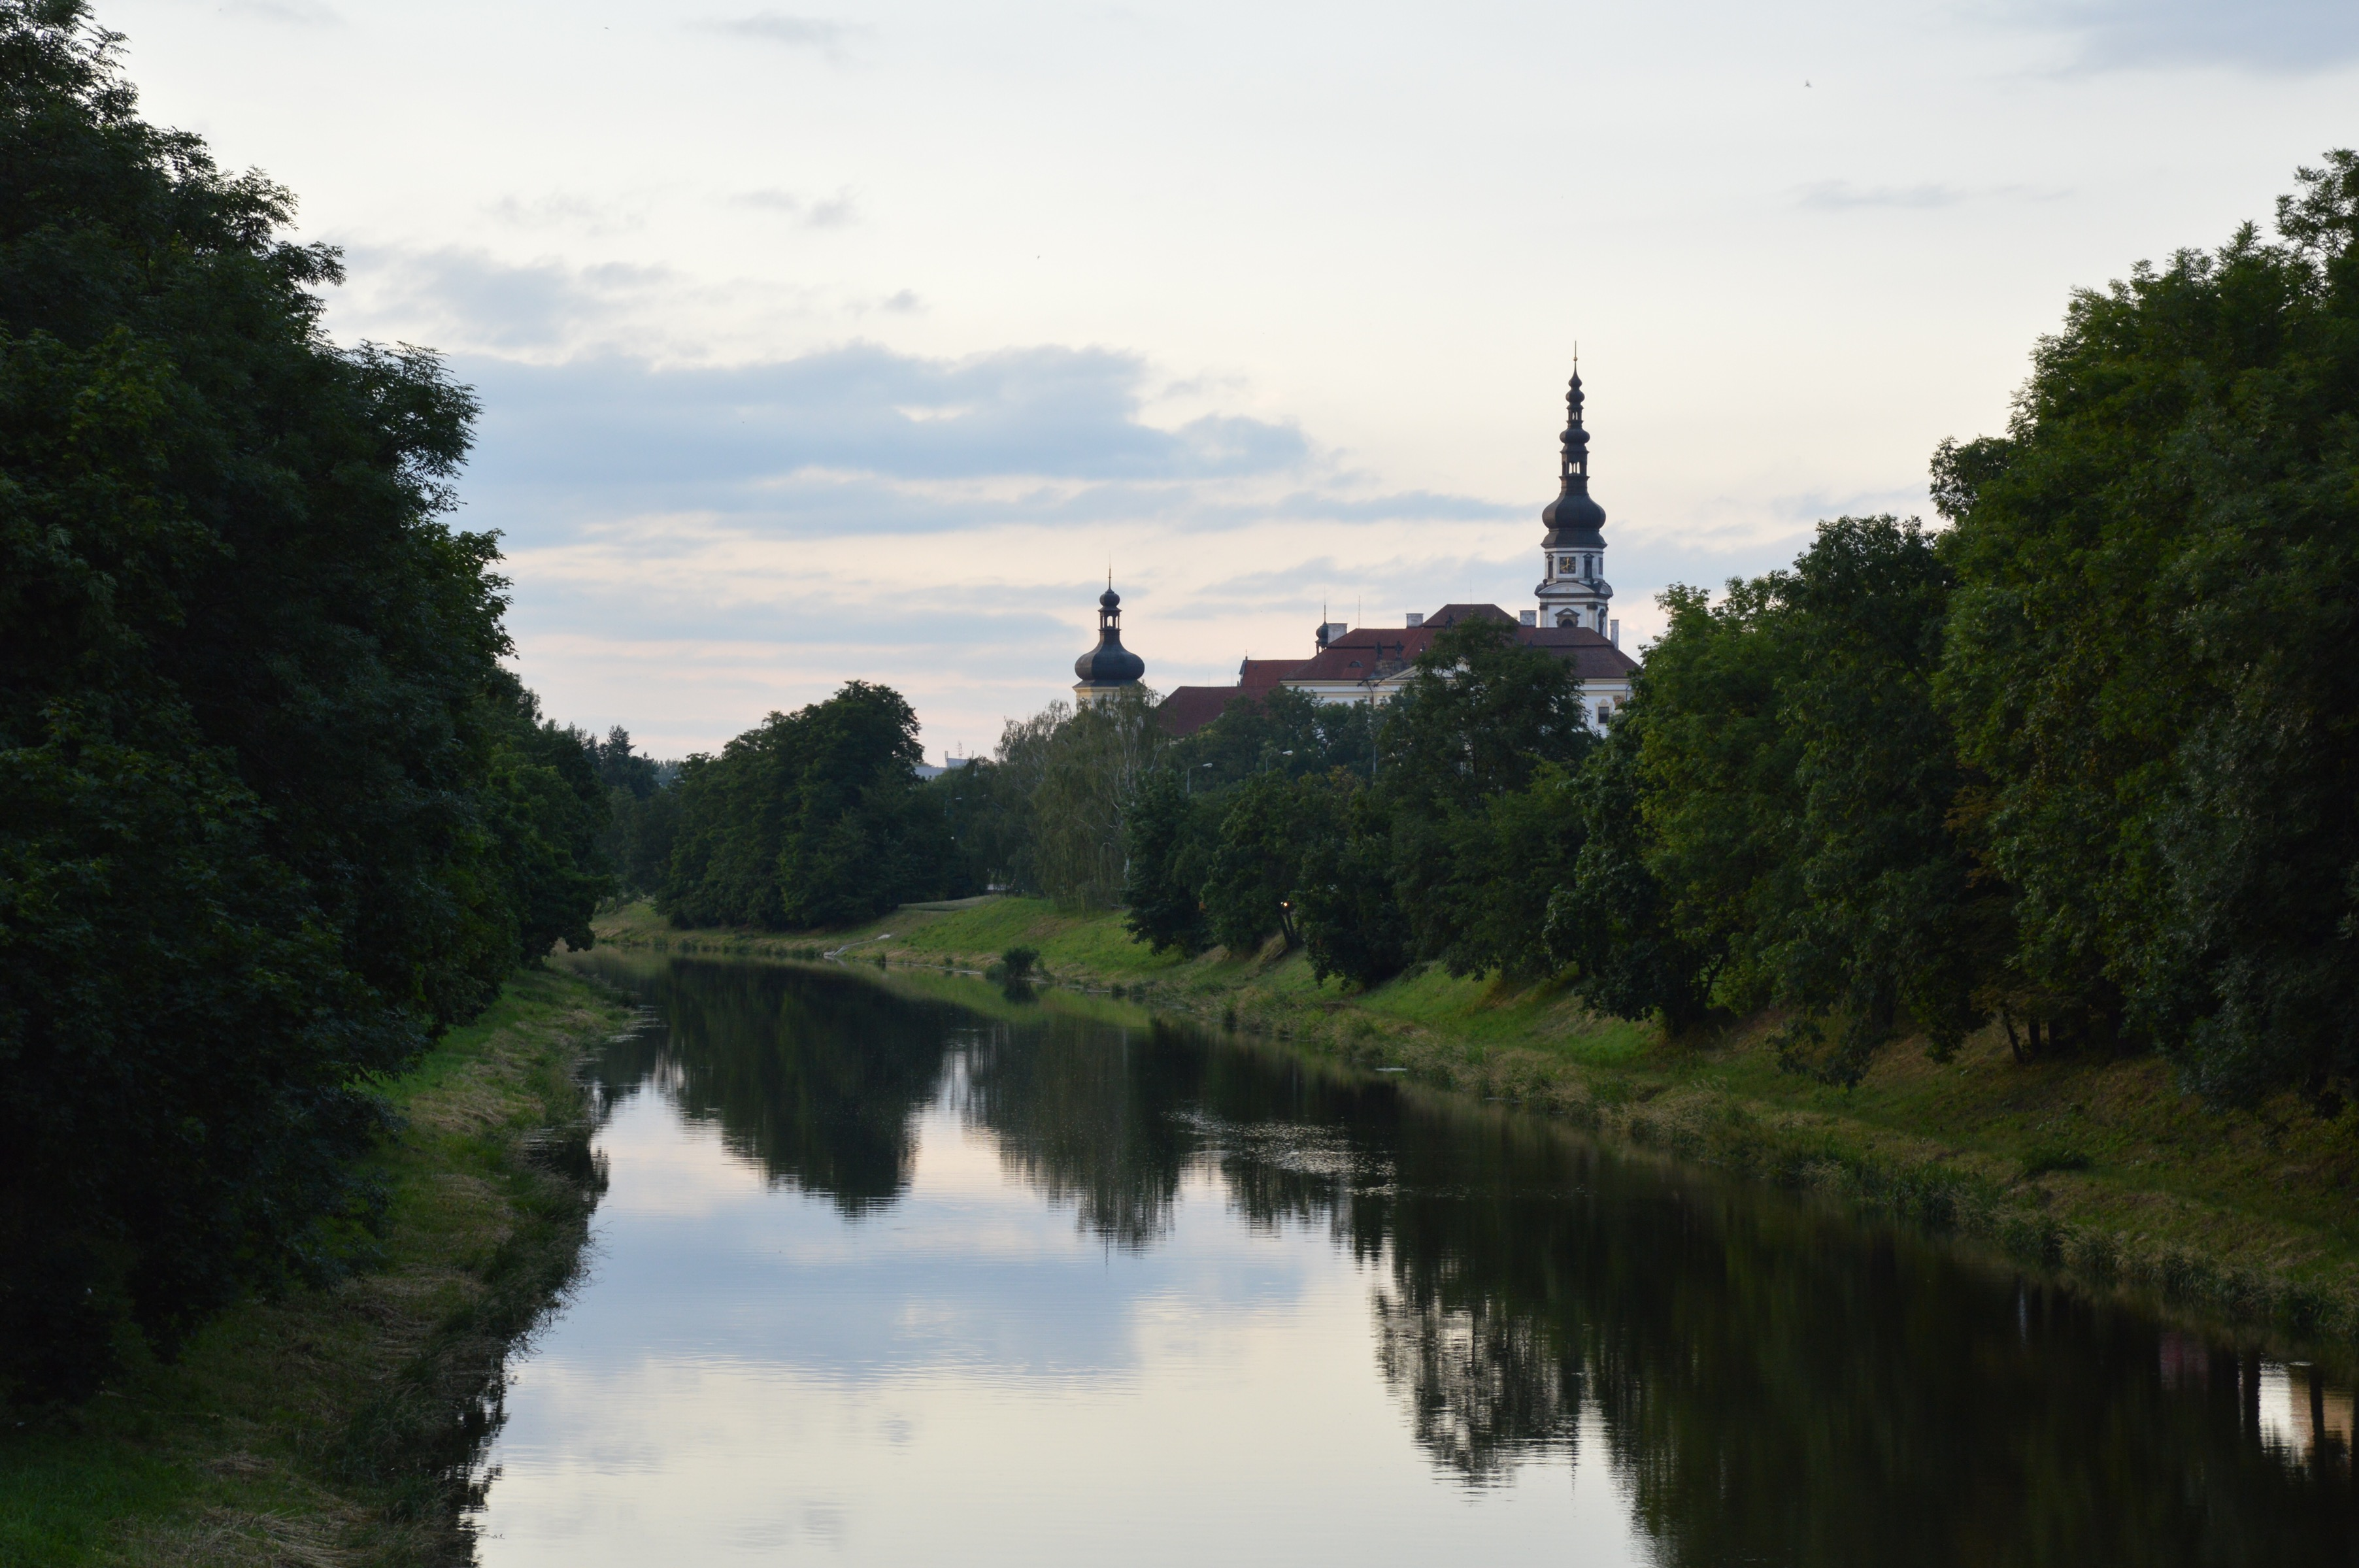 Hradisko Monastery, Olomouc, Czech Republic